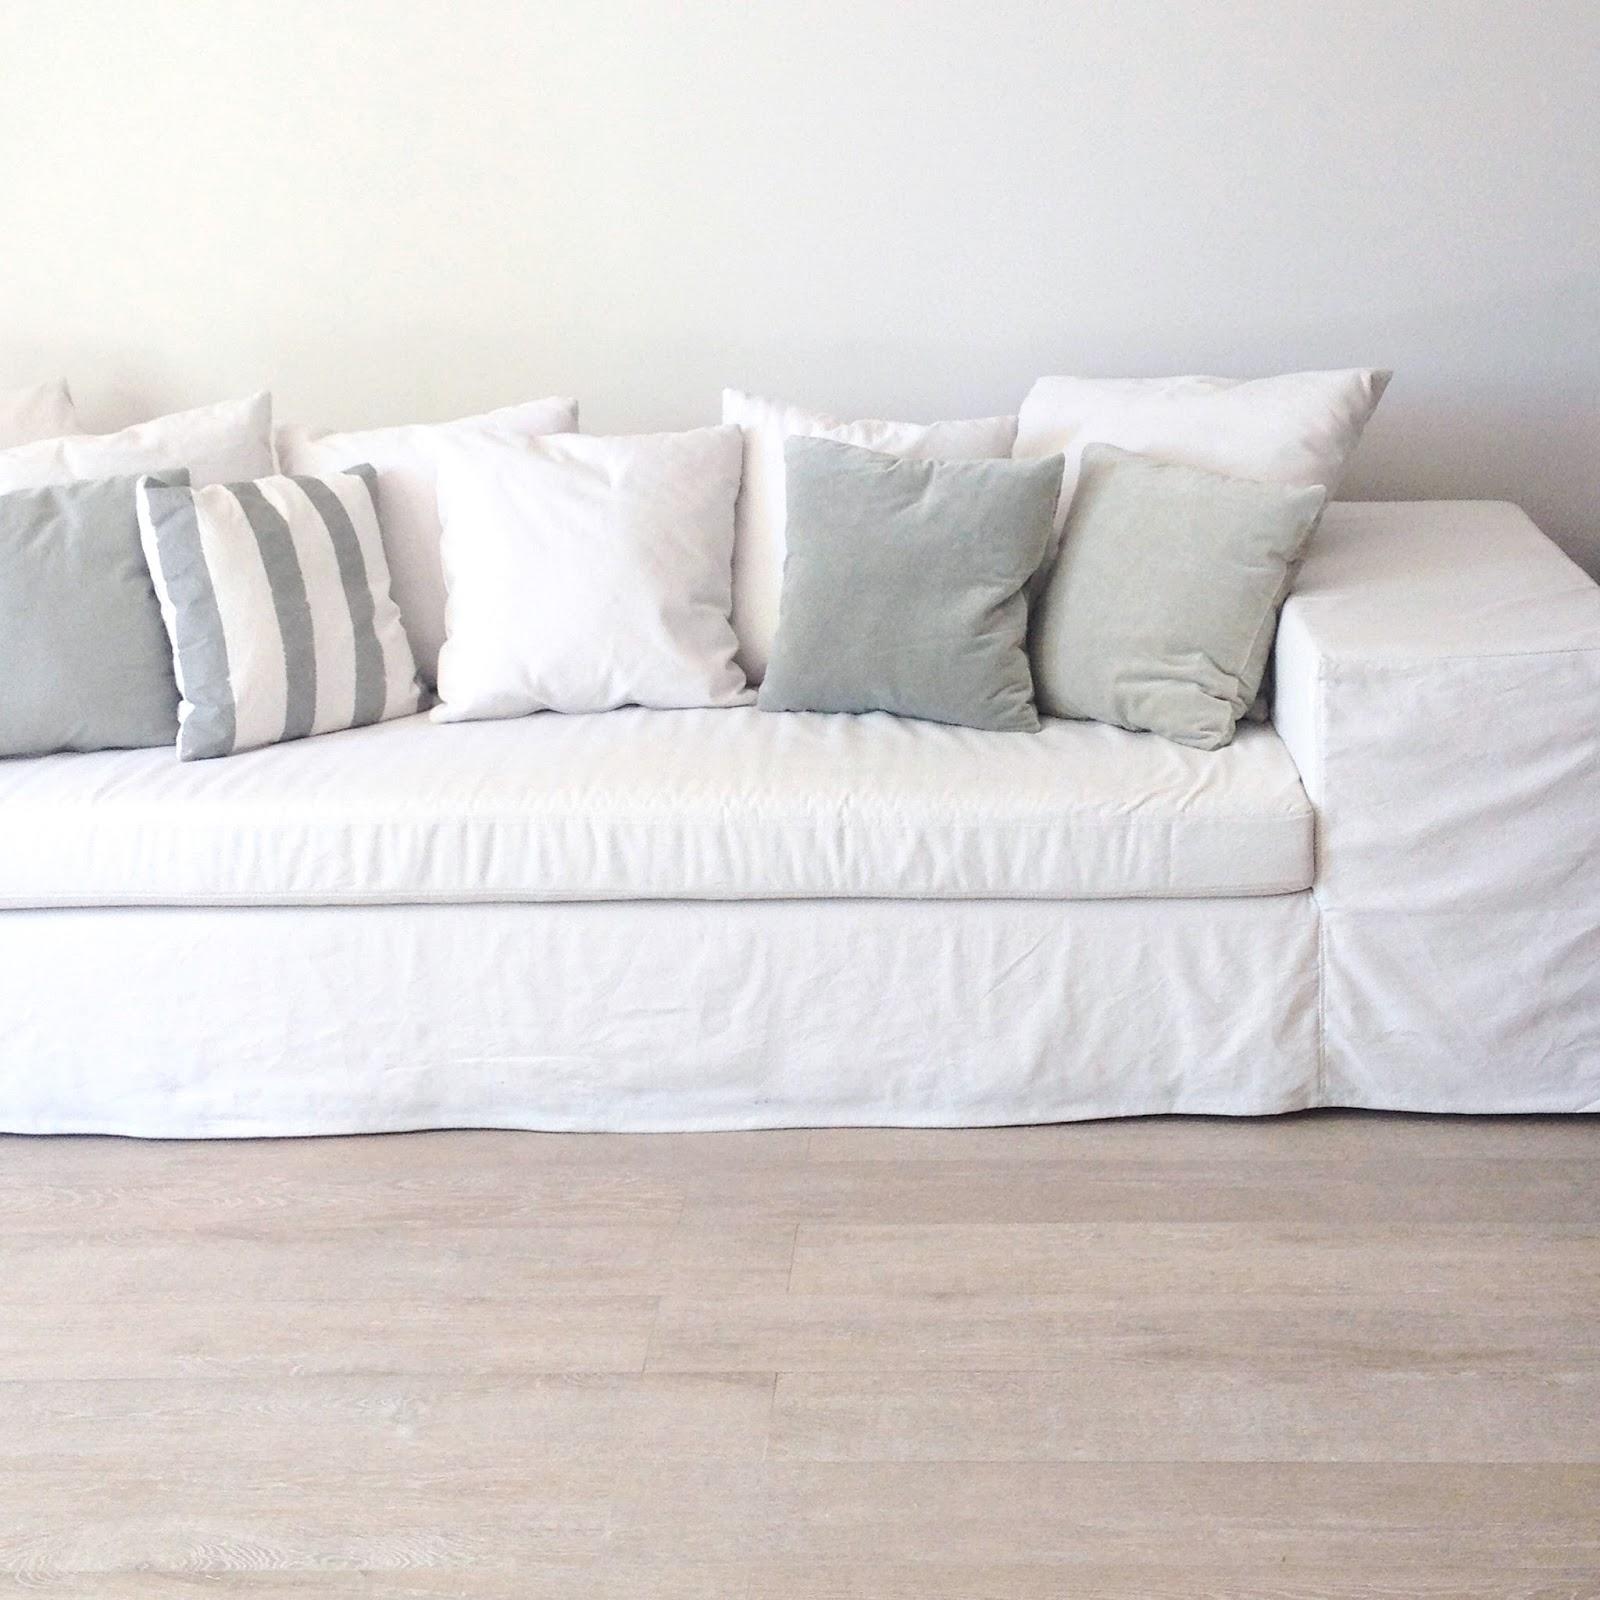 Sofa Cama Encuentra24 Panama Where To Buy Cheap Sectional Sofas Alma Deco Buenos Aires Lau